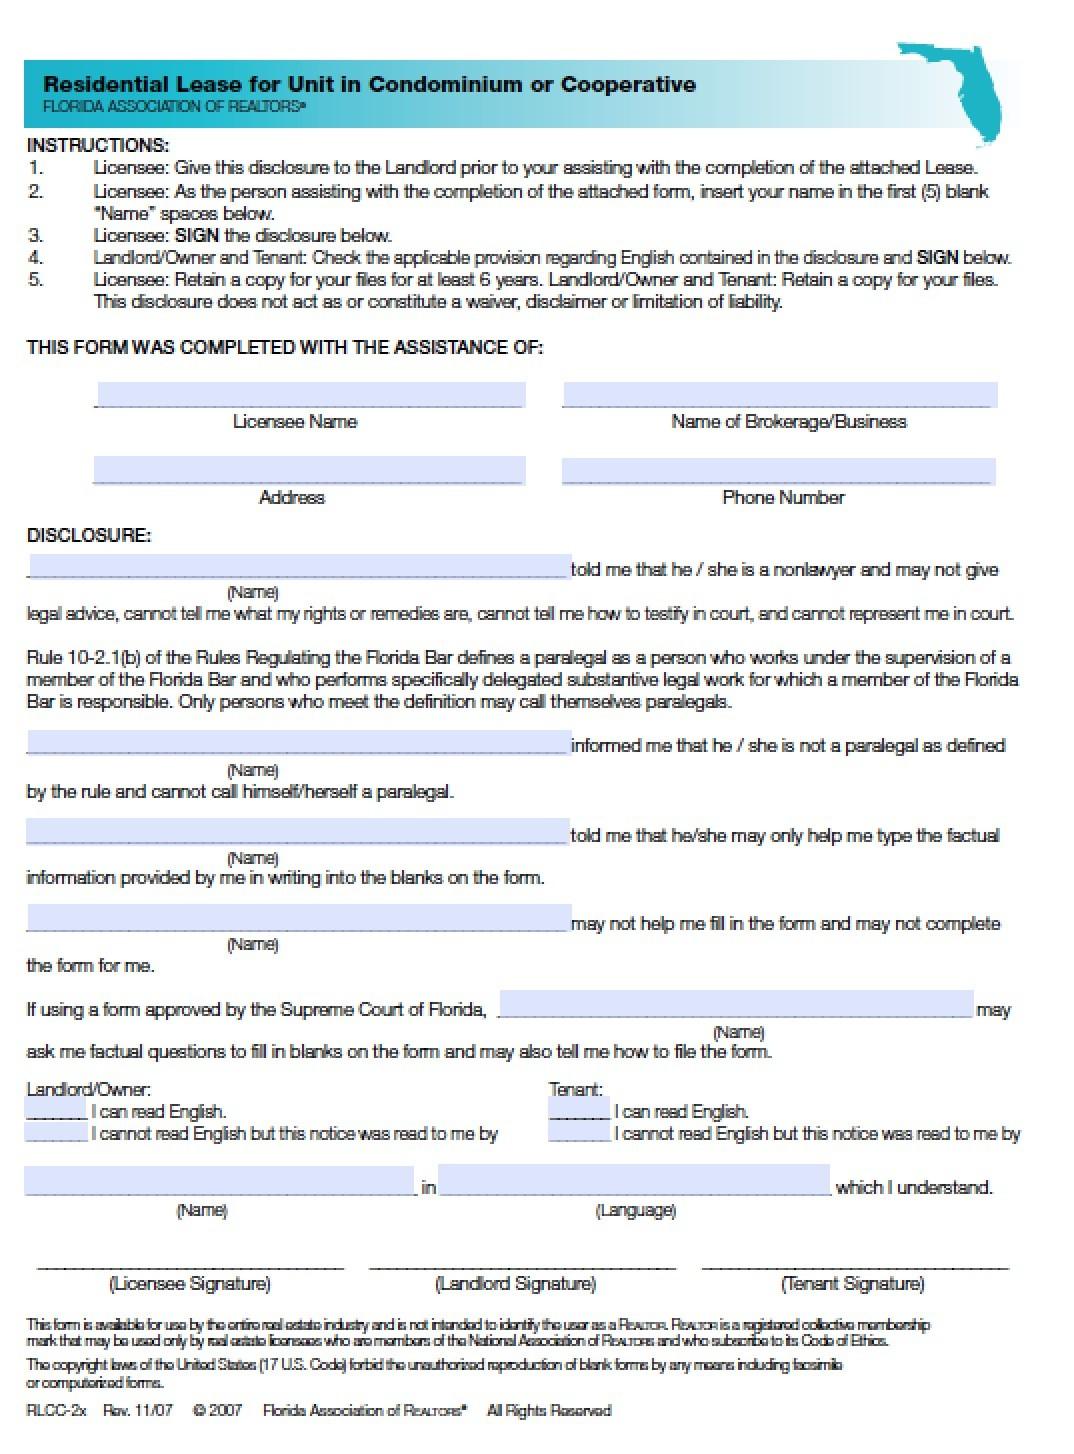 free rental agreement form florida .pdf  Download Florida Rental Lease Agreement Forms and ... - free rental agreement form florida